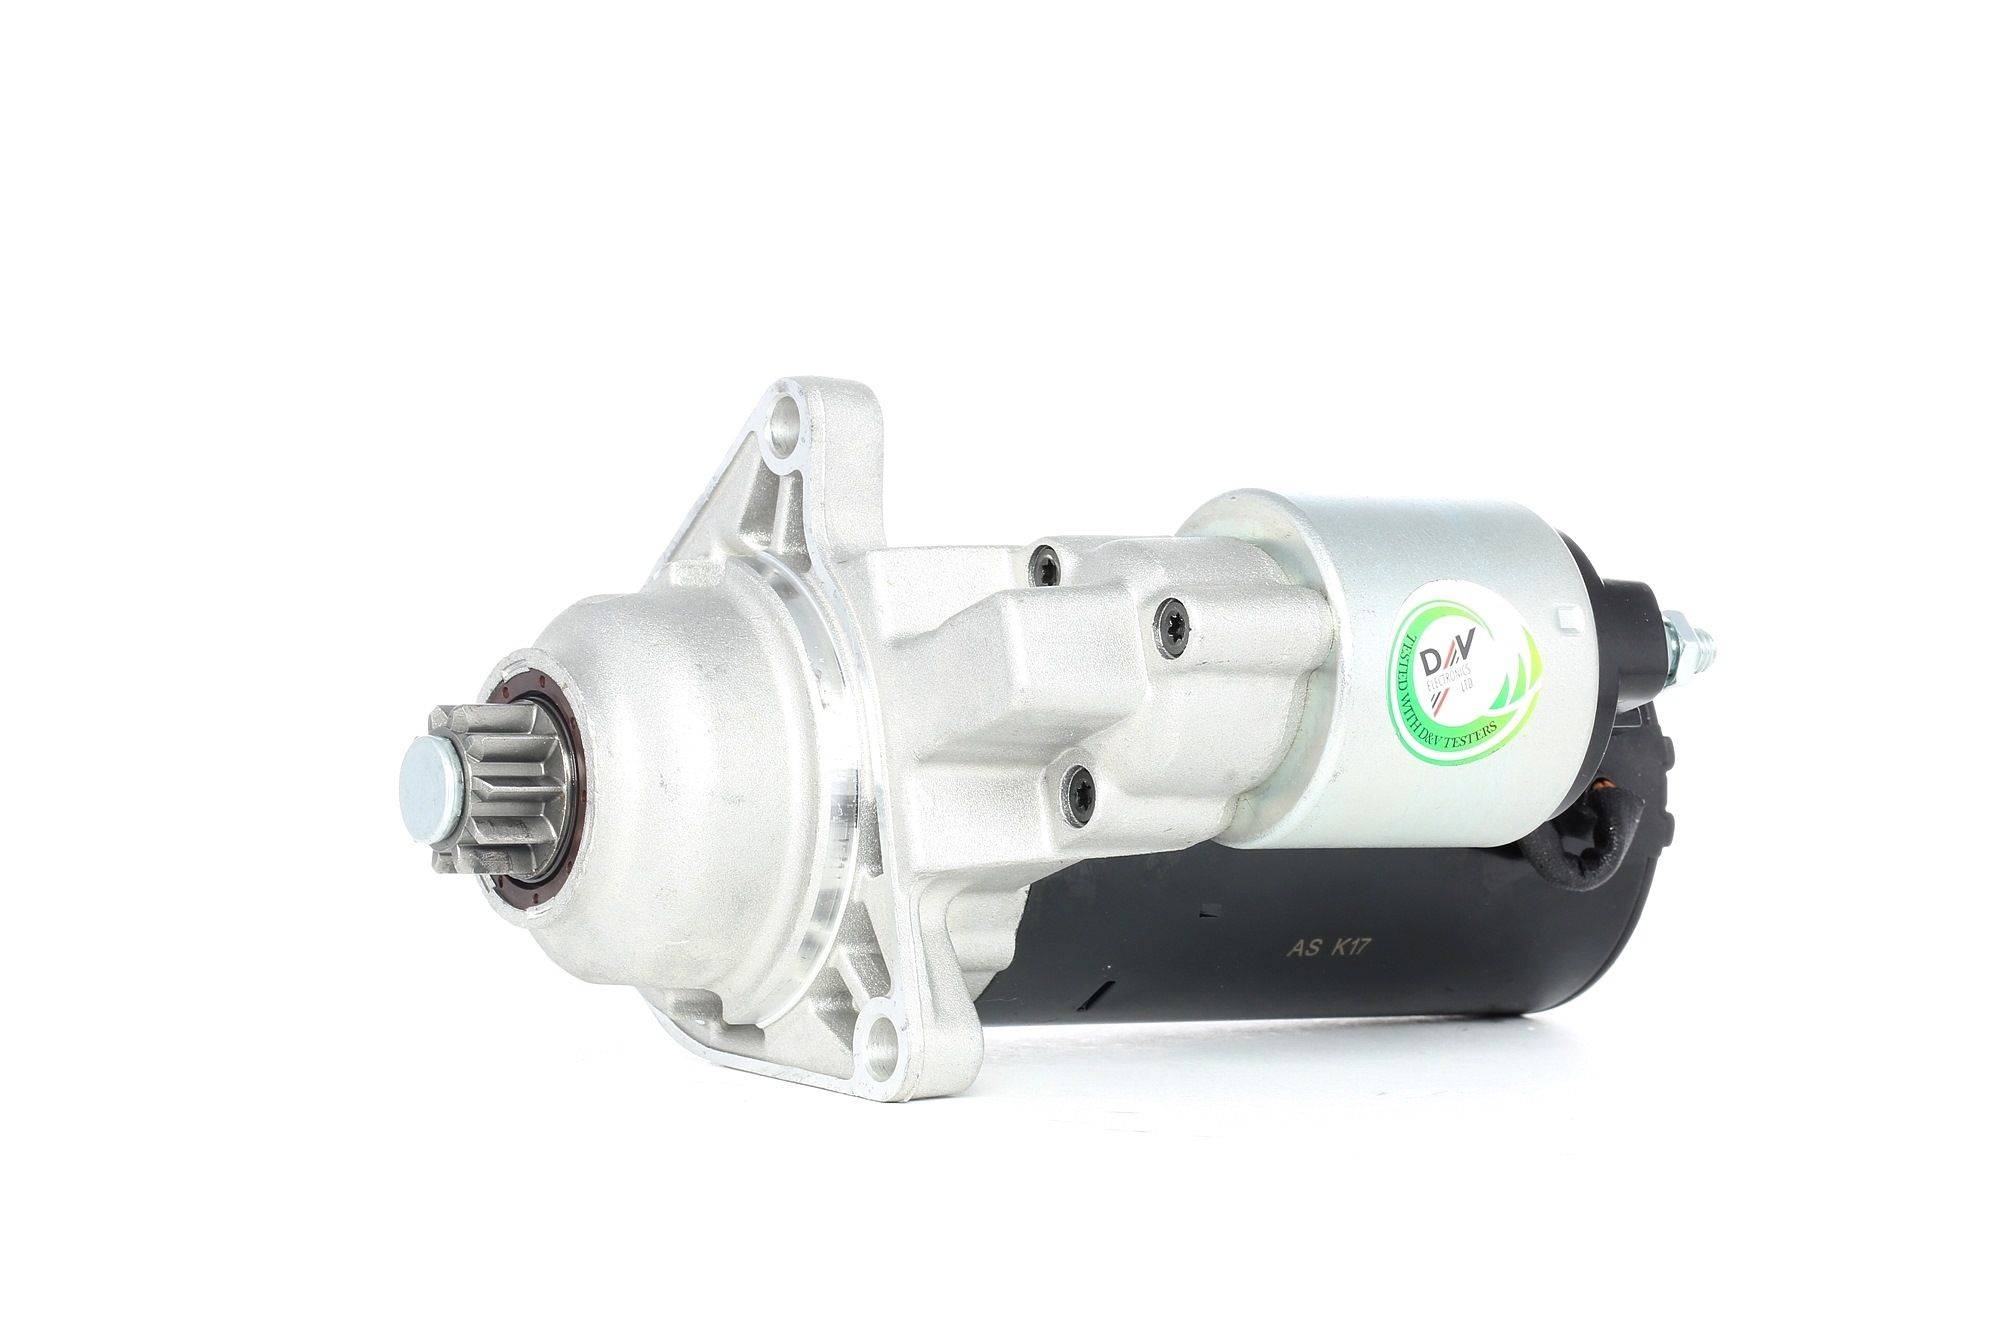 AS-PL Starttimoottori Brand new AS-PL Alternator LR150201 S0005 Startti,Käynnistinmoottori VW,SEAT,TRANSPORTER IV Bus 70XB, 70XC, 7DB, 7DW